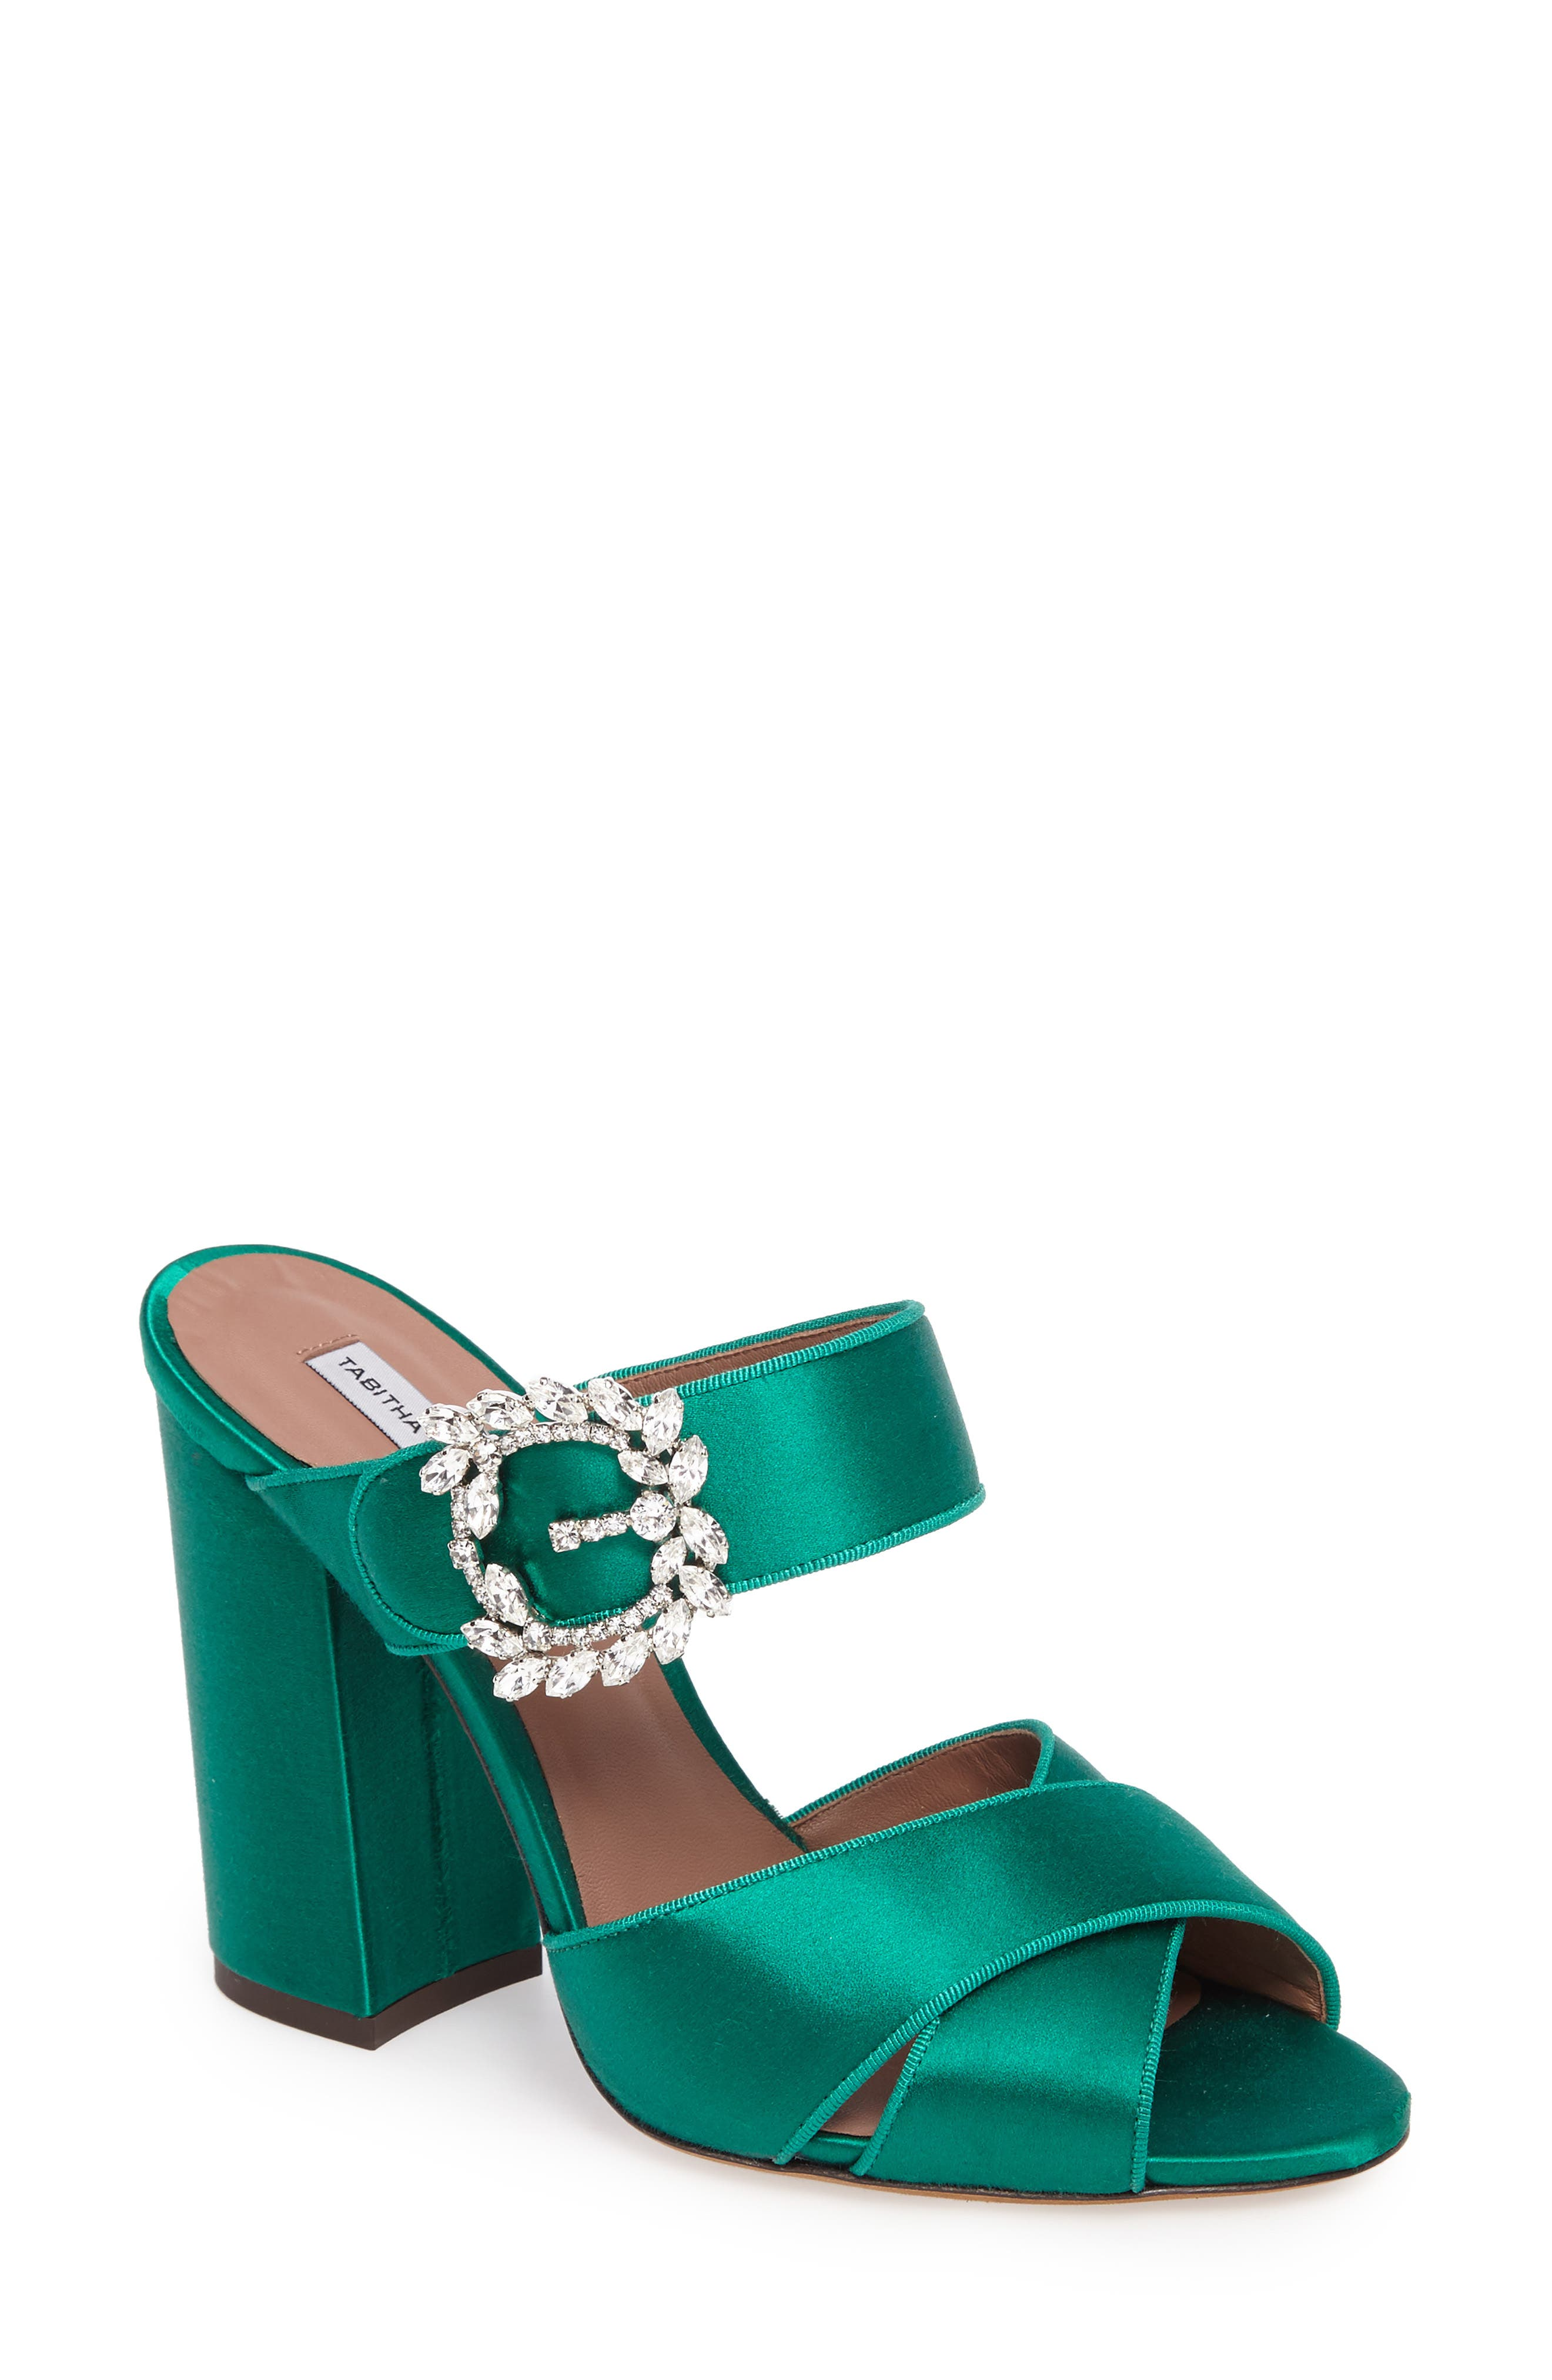 Reyner Crystal Buckle Sandal,                             Main thumbnail 1, color,                             Emerald Green